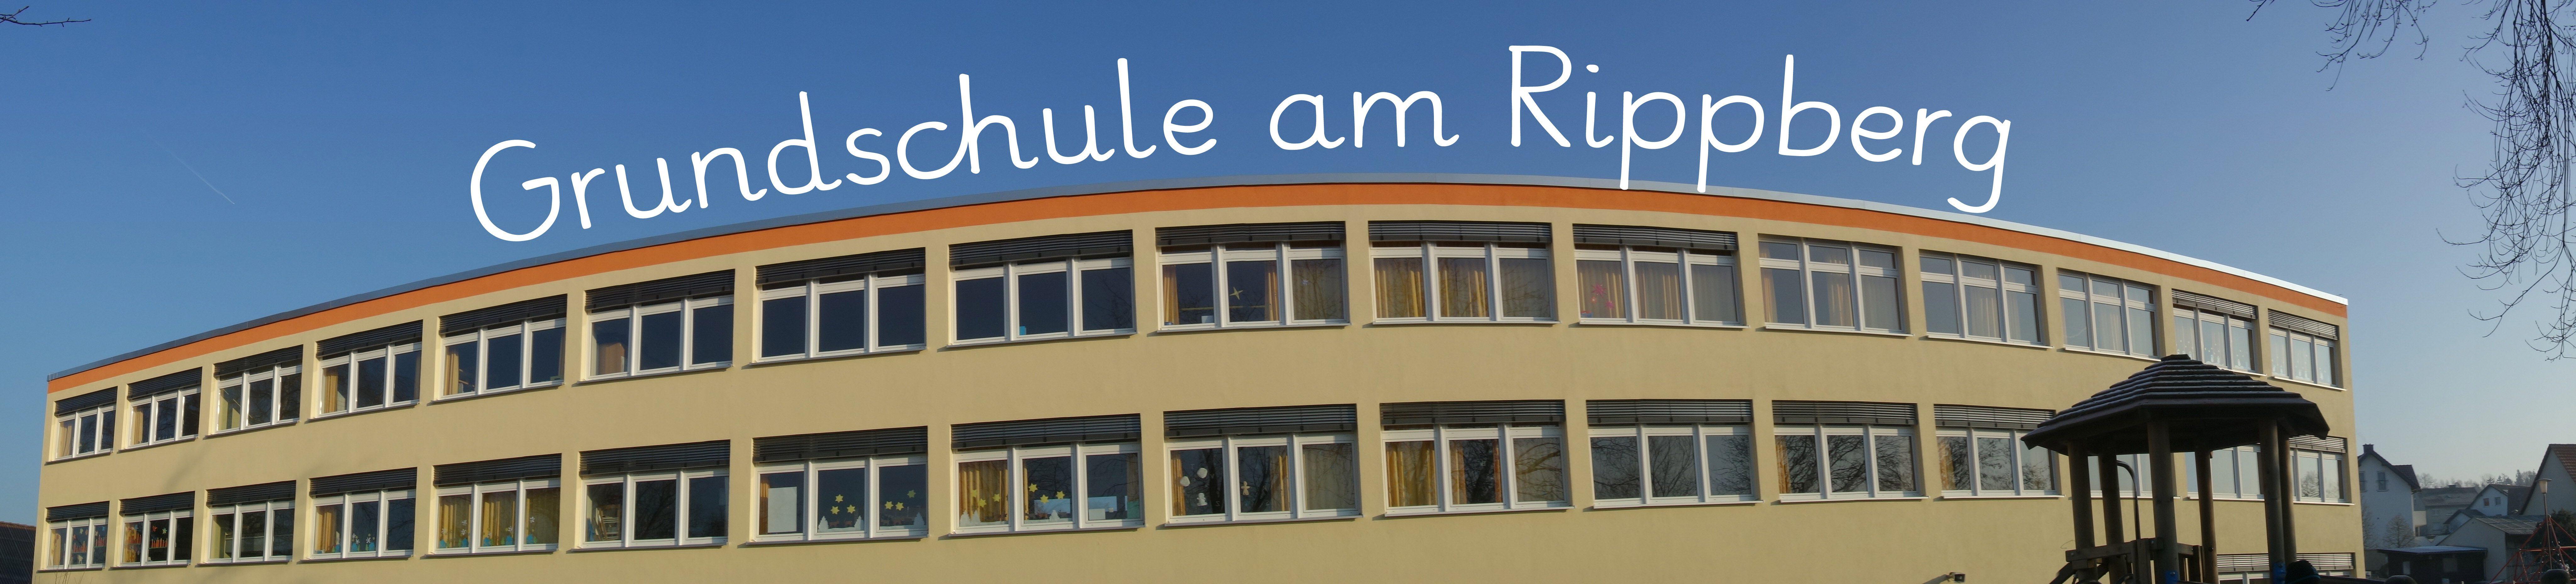 Grundschule am Rippberg